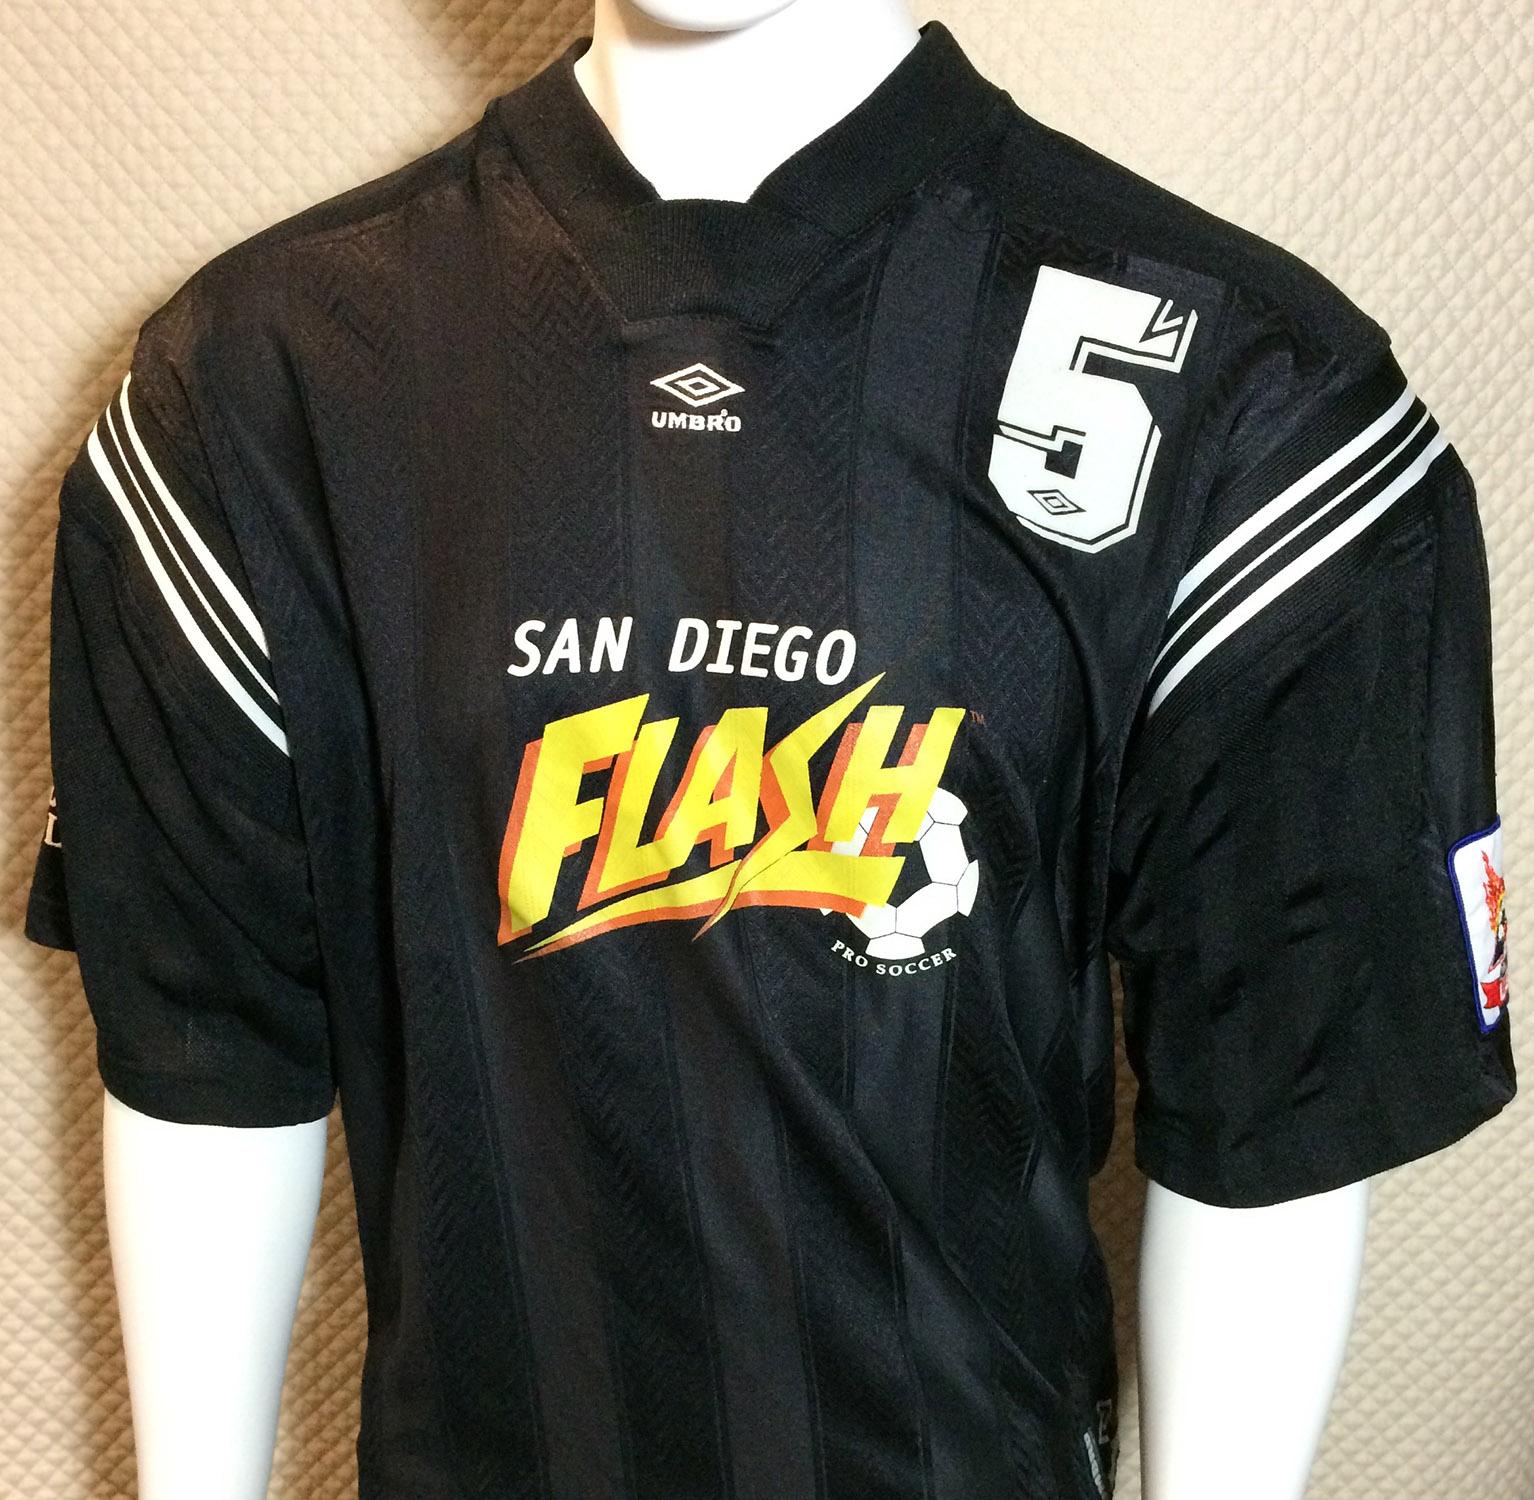 San Diego Flash 1999 A-League Jersey